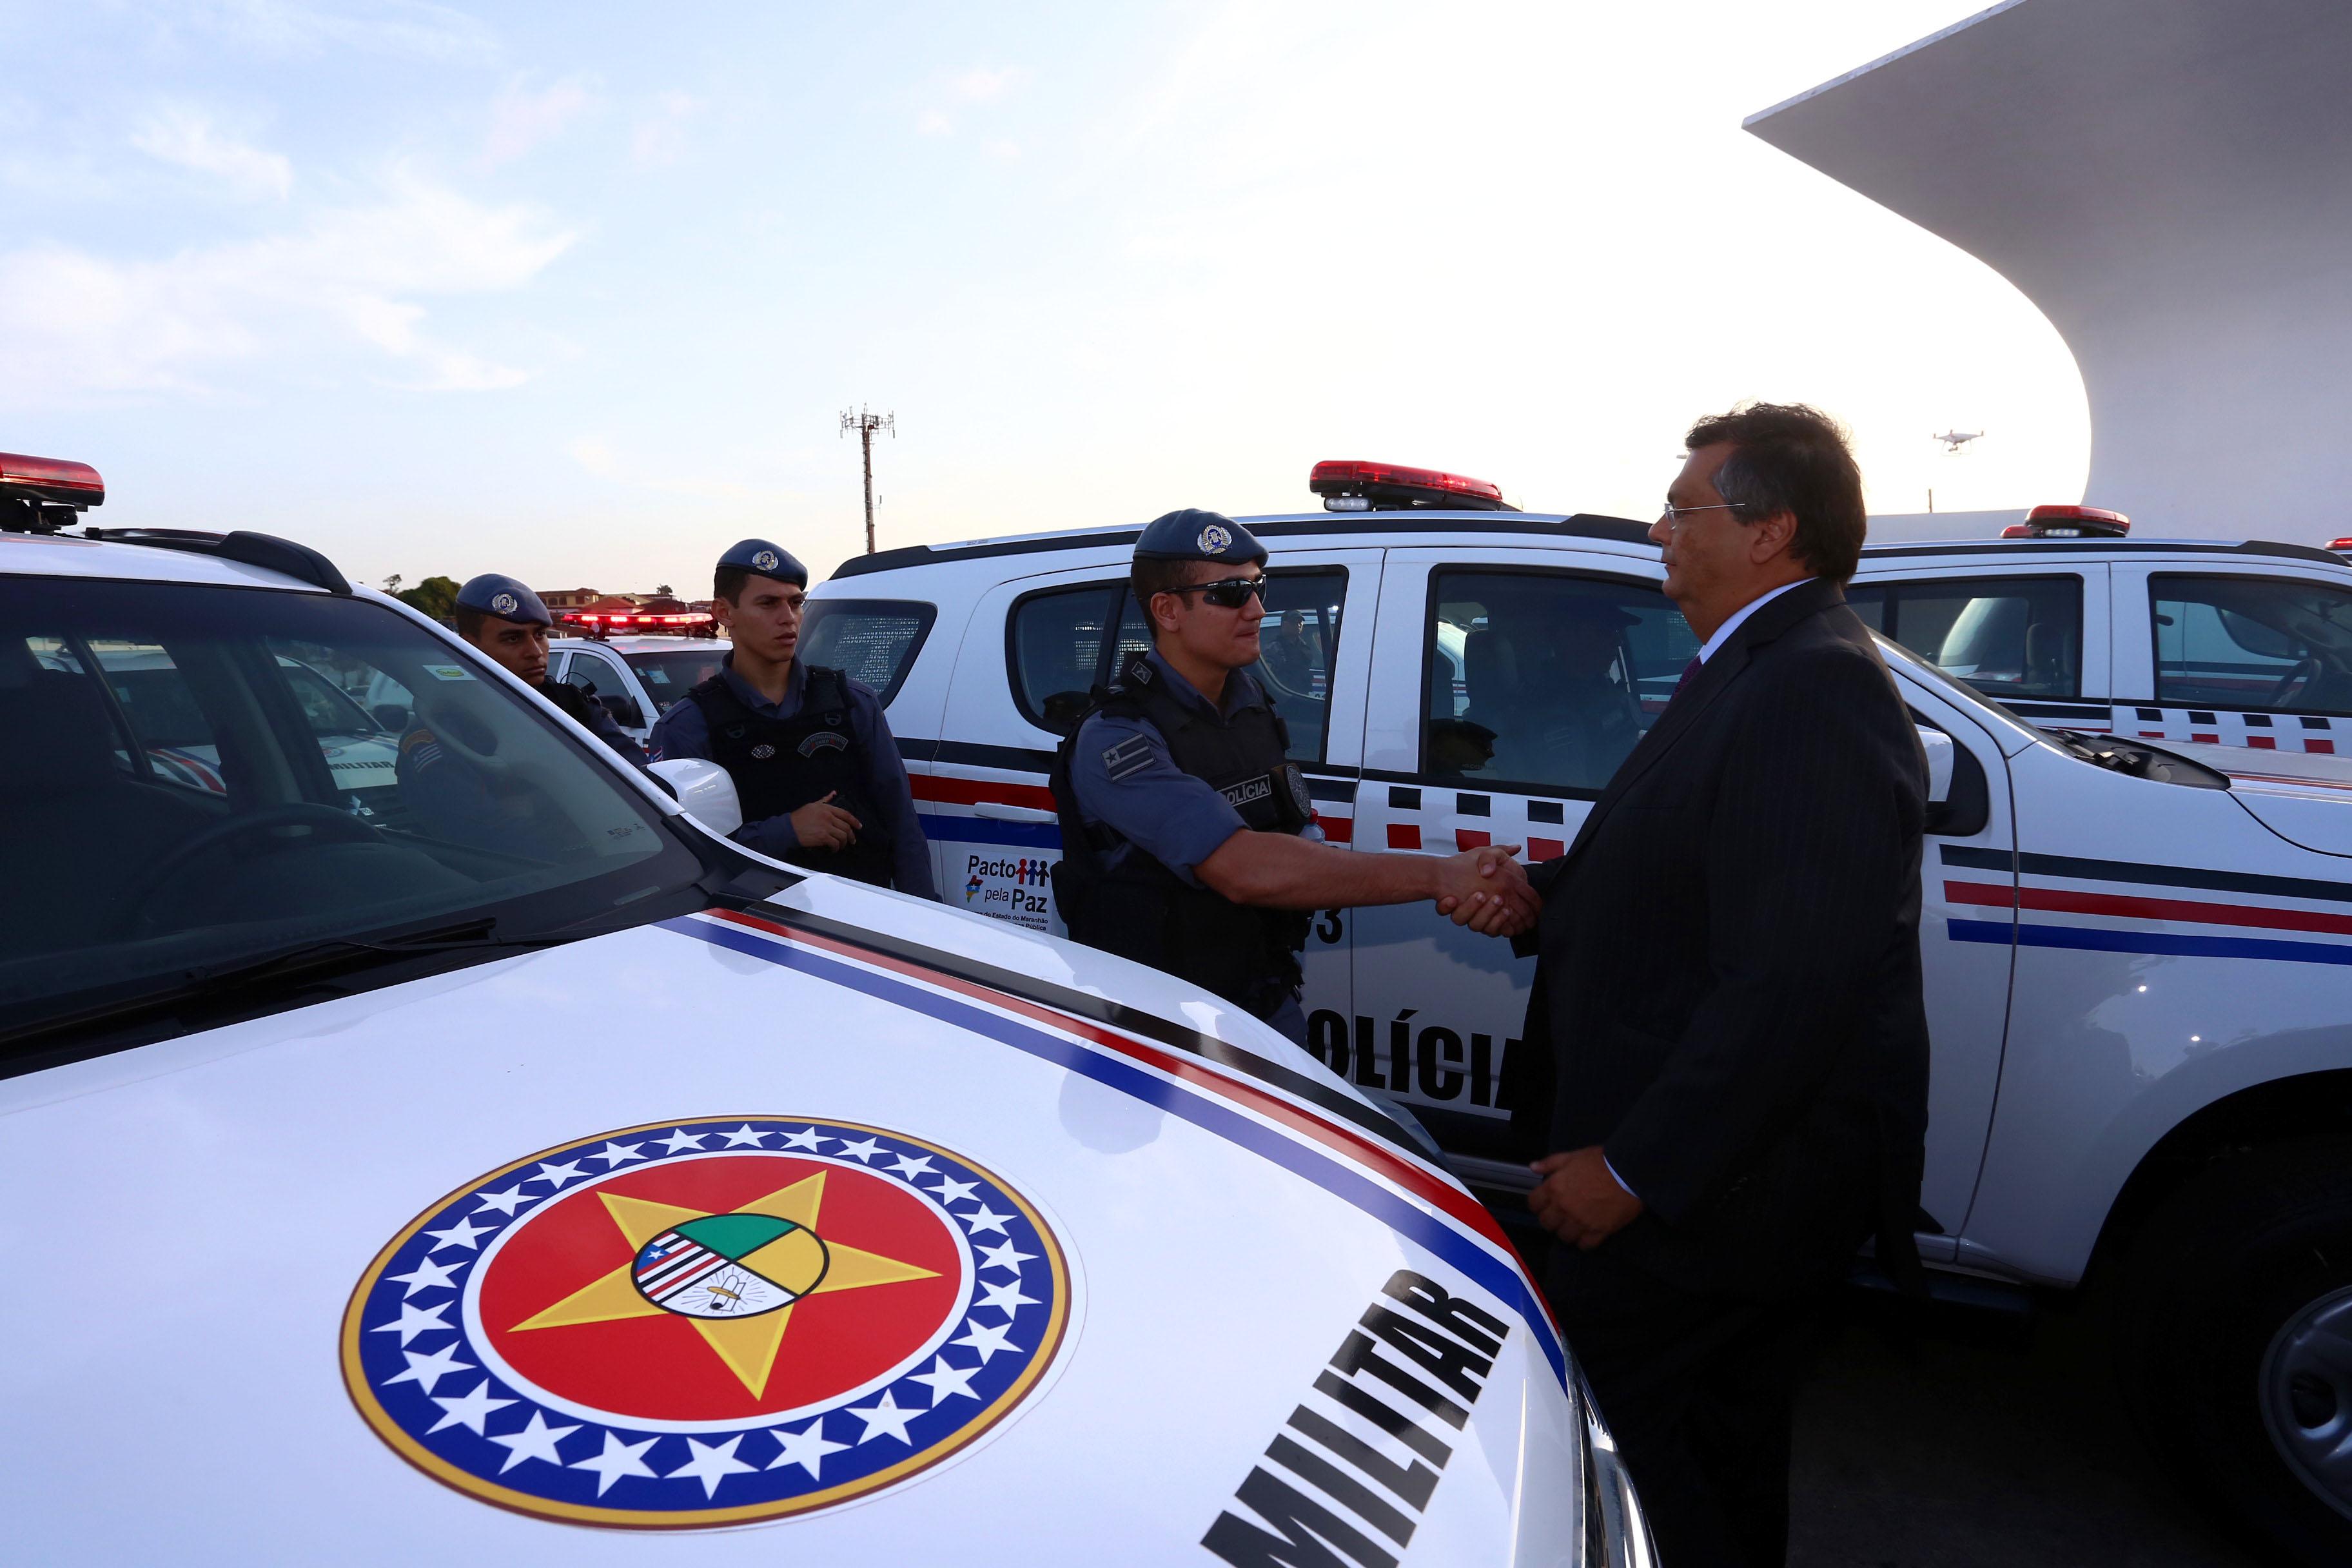 entrega-de-novas-viaturas-para-policia-civil-e-militar-foto-gilson-teixeira-14